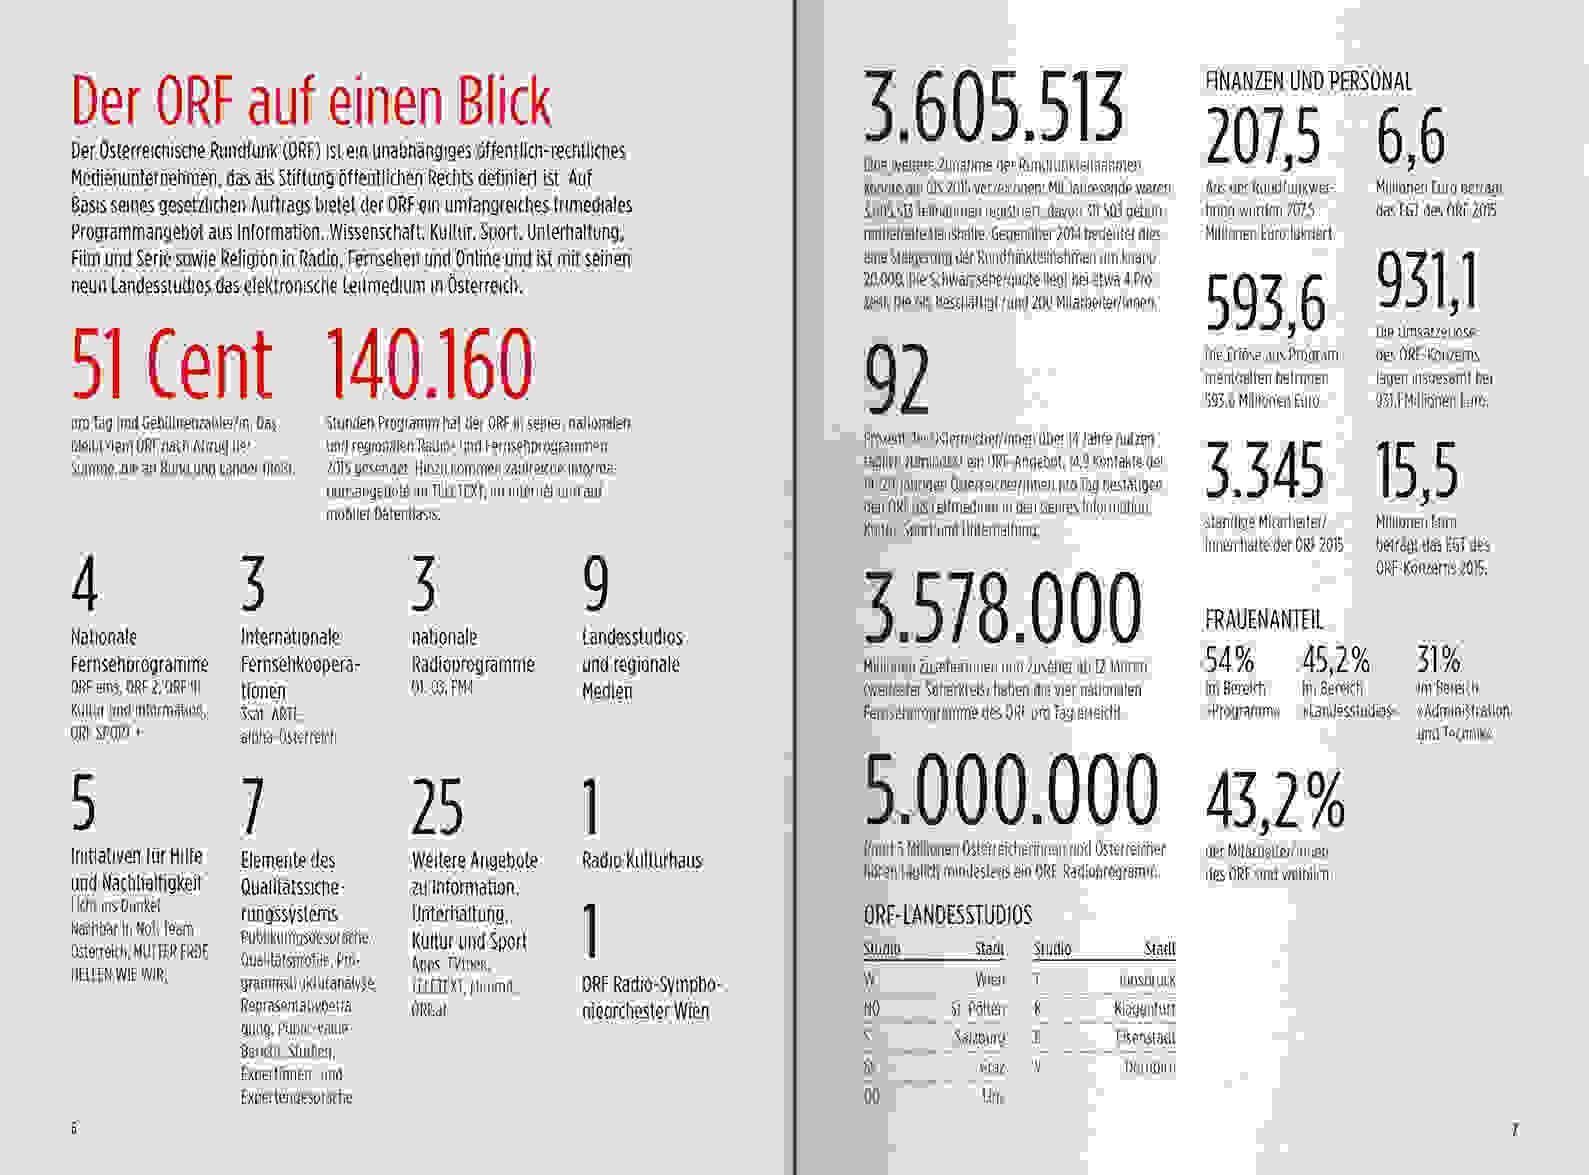 ORF PV 2016 Zahlen Slider Doppelseite 2